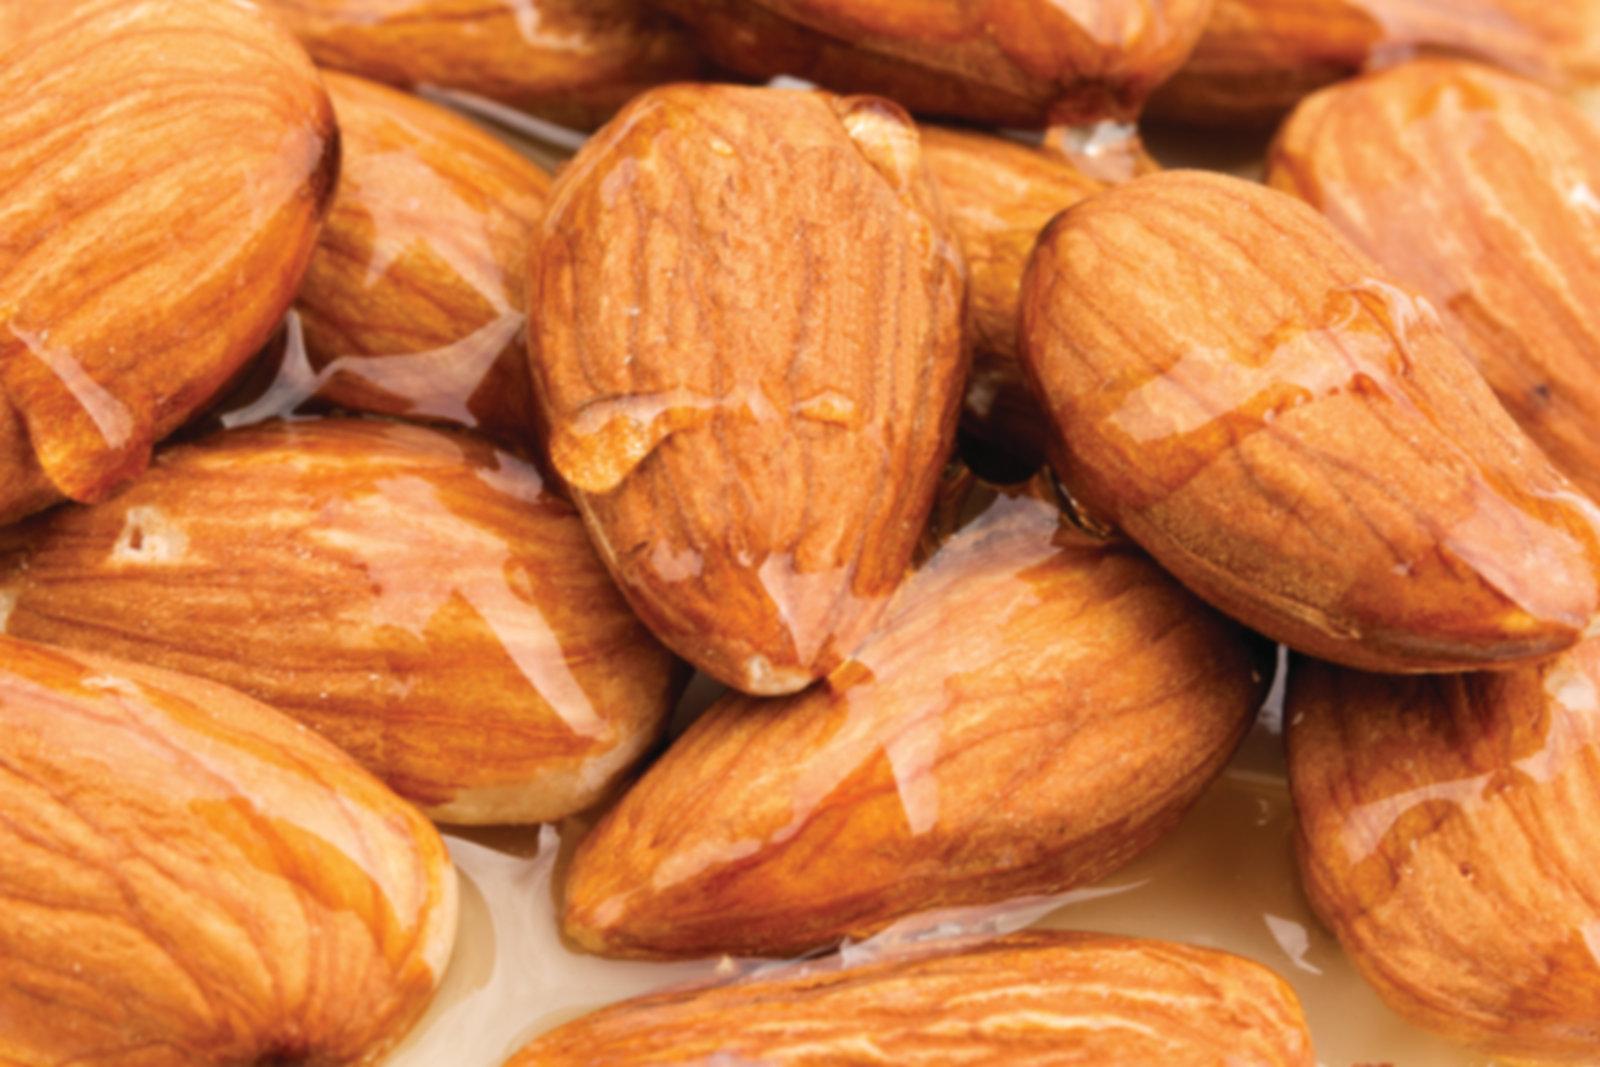 almonds3.jpg